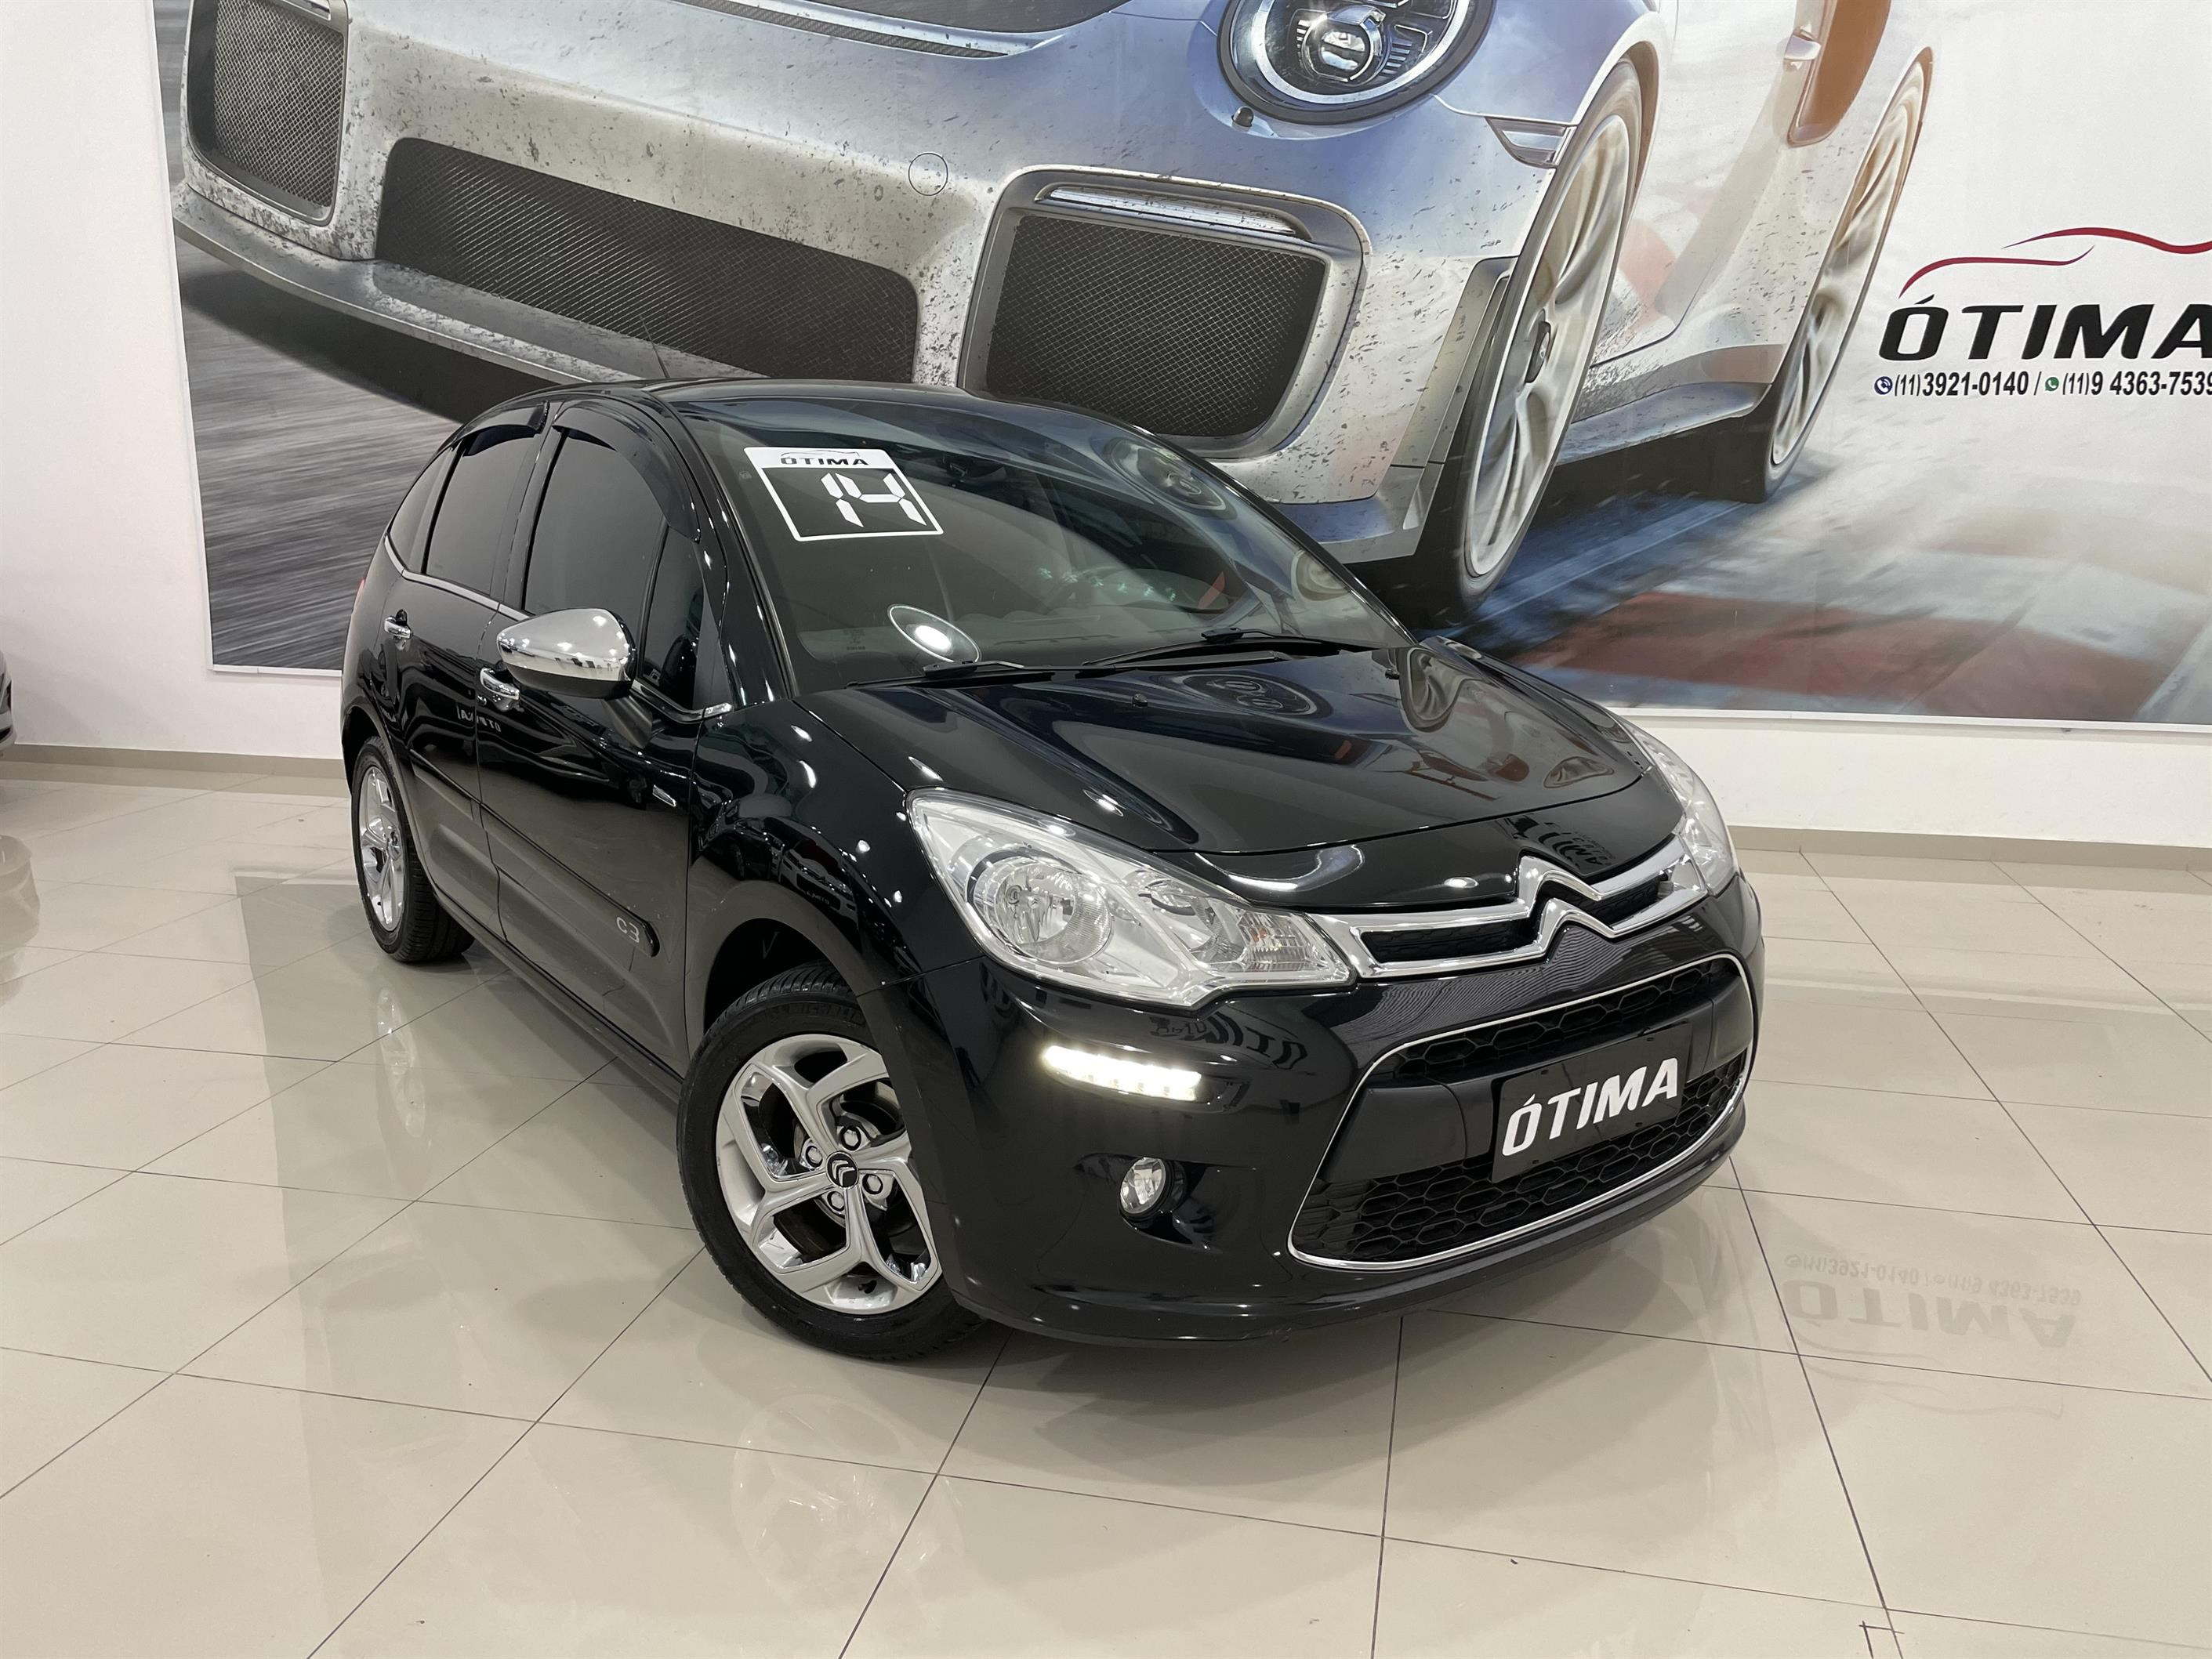 //www.autoline.com.br/carro/citroen/c3-16-120-exclusive-16v-flex-4p-automatico/2014/sao-paulo-sp/14449602